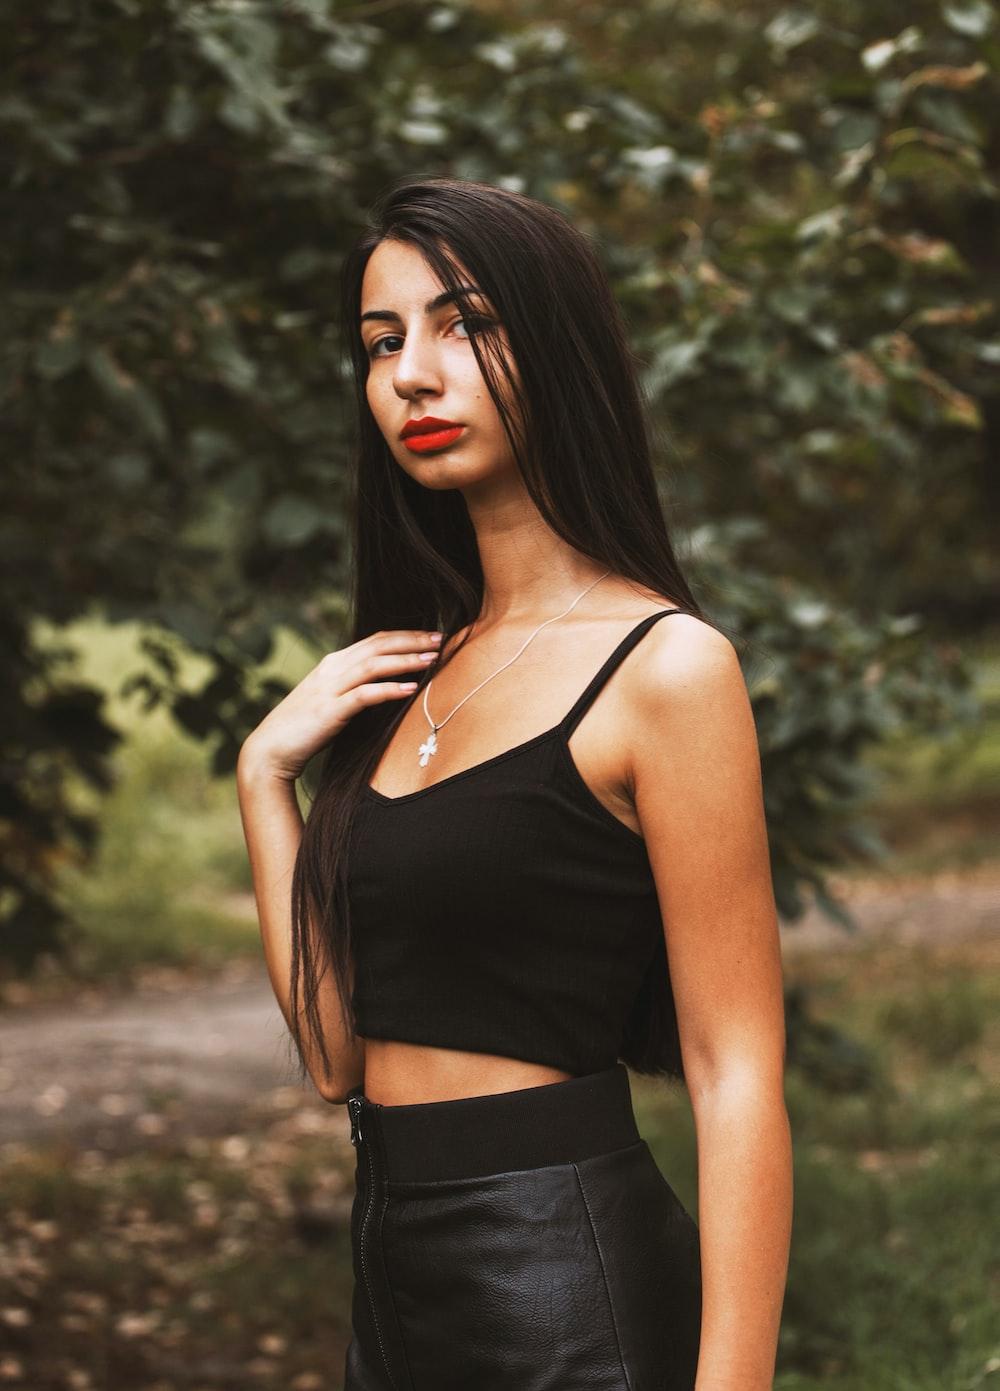 woman in black spaghetti strap top and black bottoms